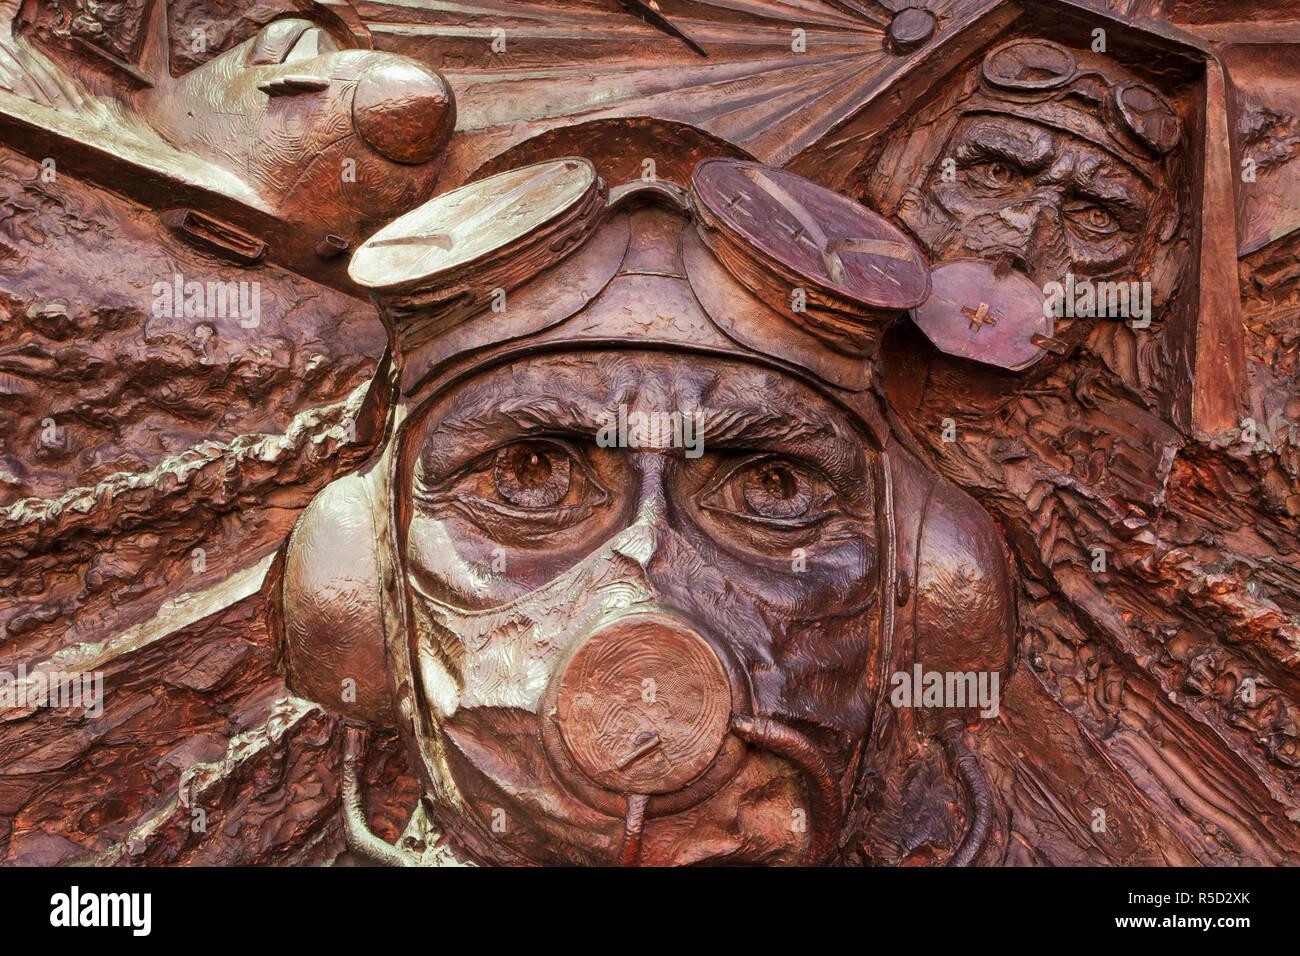 England, London, Embankment, Detail of Battle of Britain Memorial - Stock Image